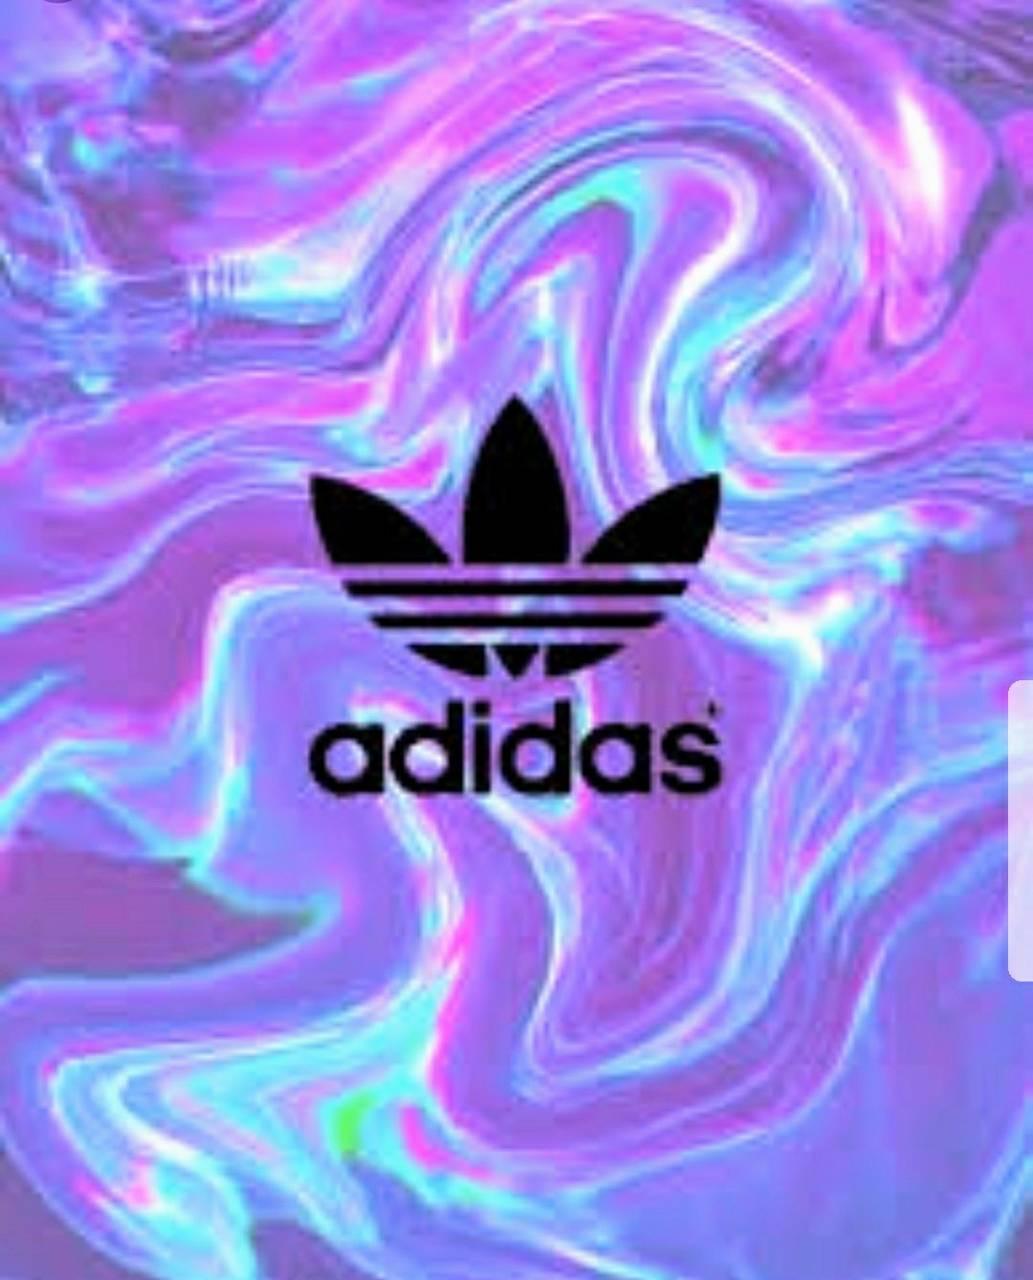 Purple Adidas Wallpapers On Wallpaperdog